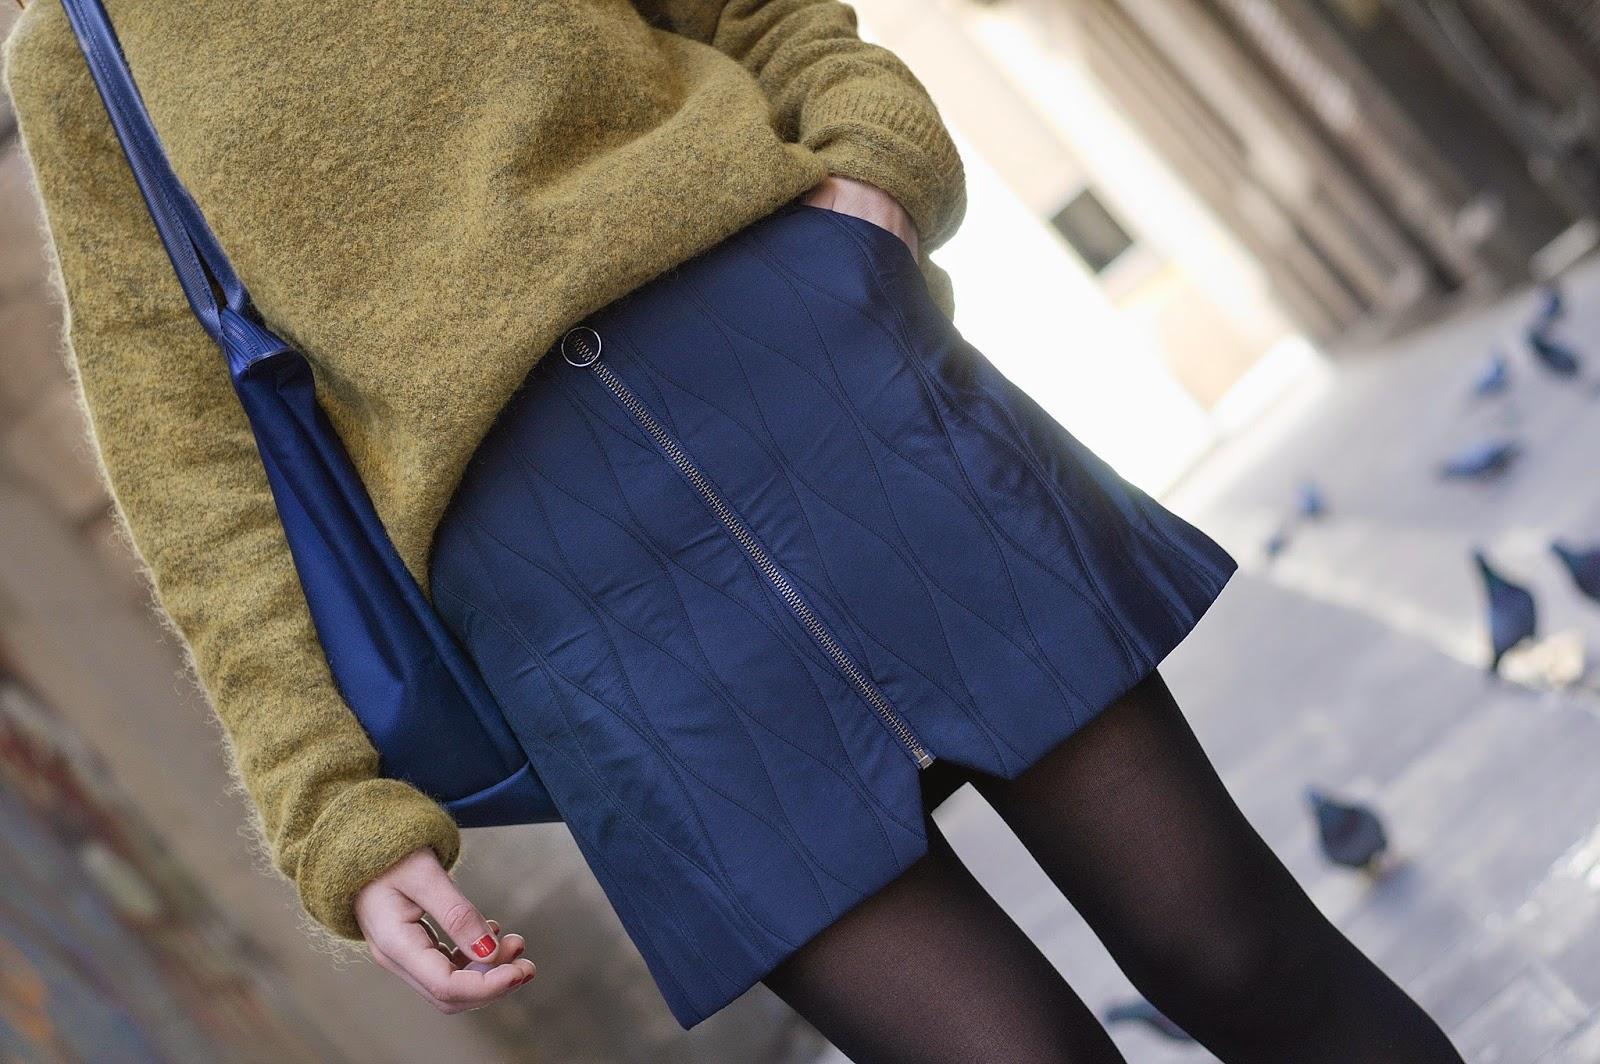 Jersey HM, Falda TopShop, Bolso Longchamp, zapatos Urban Outfiters